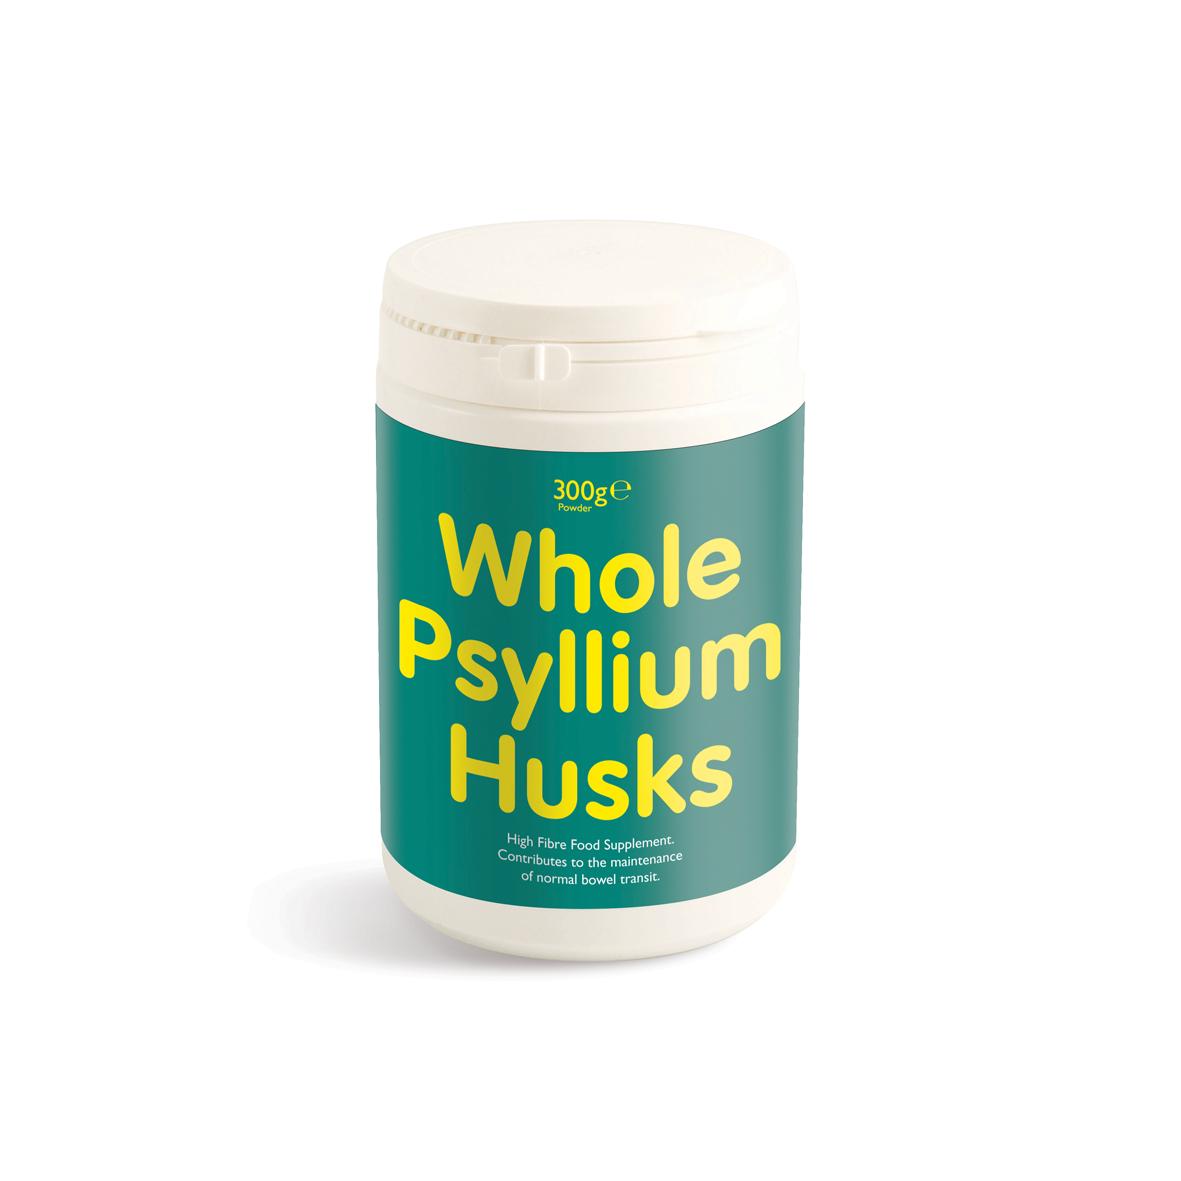 Whole Psyllium Husks 300g